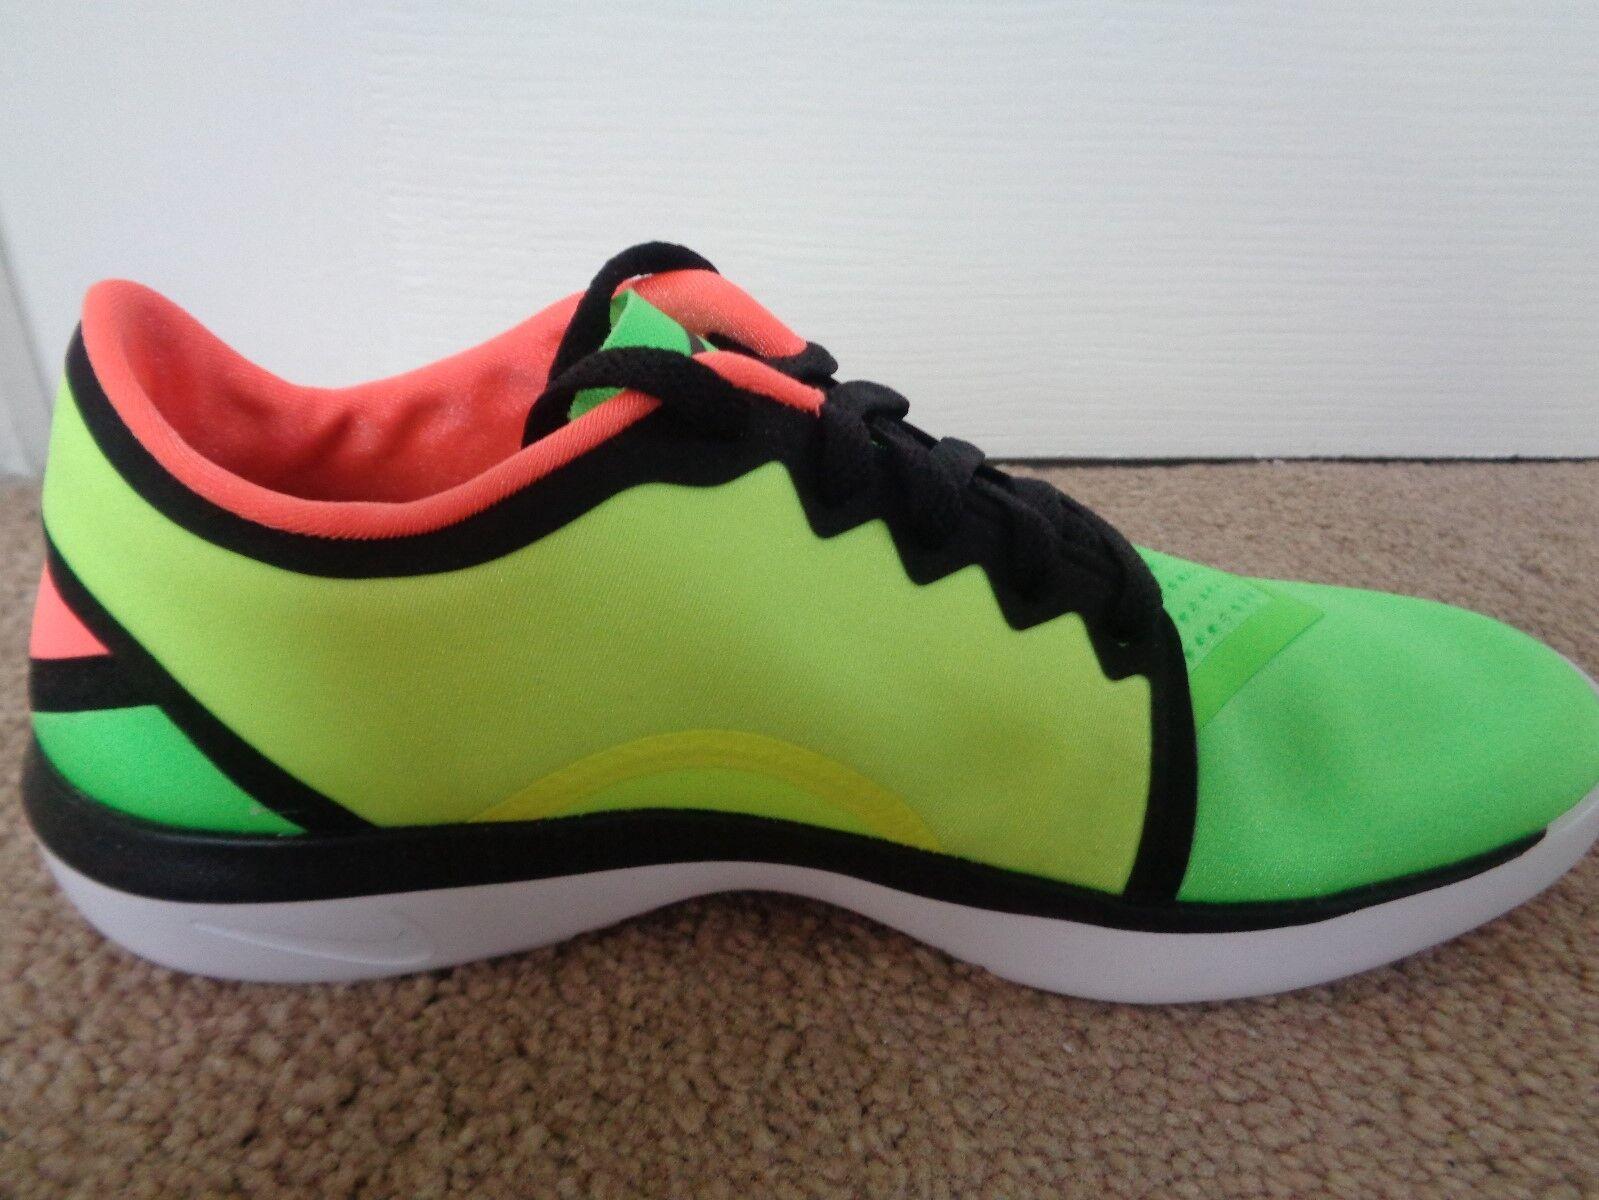 Nike lunar sculpt Damenss 300 trainers Turnschuhe schuhe 818062 300 Damenss NEW+BOX dcf49e